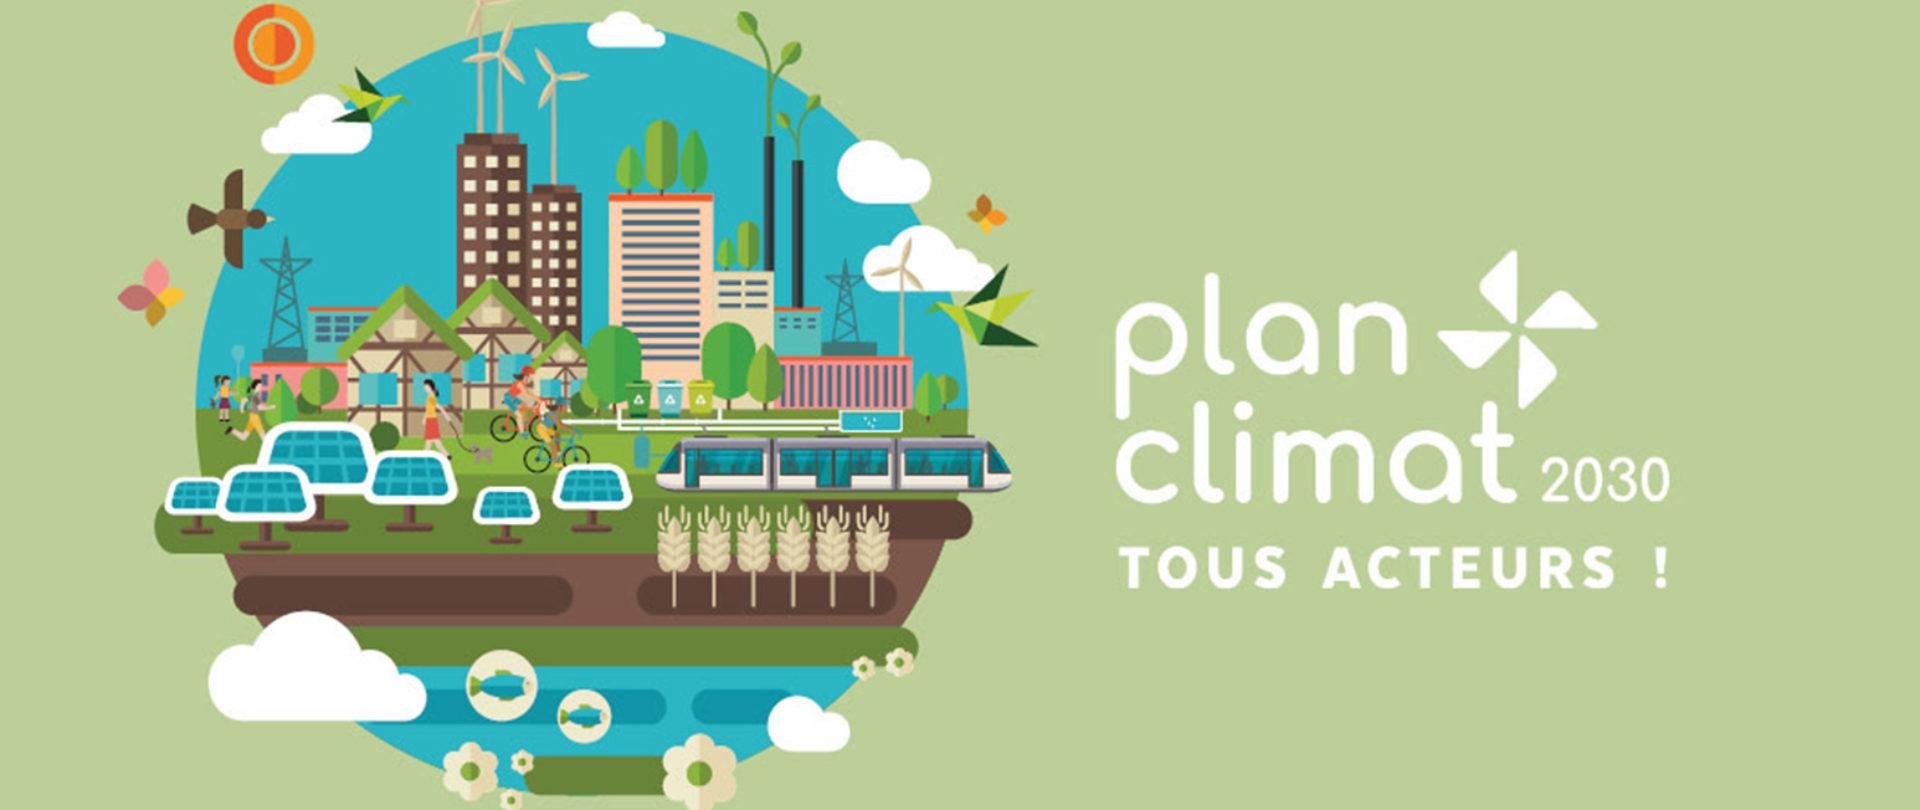 Plan climat 2030